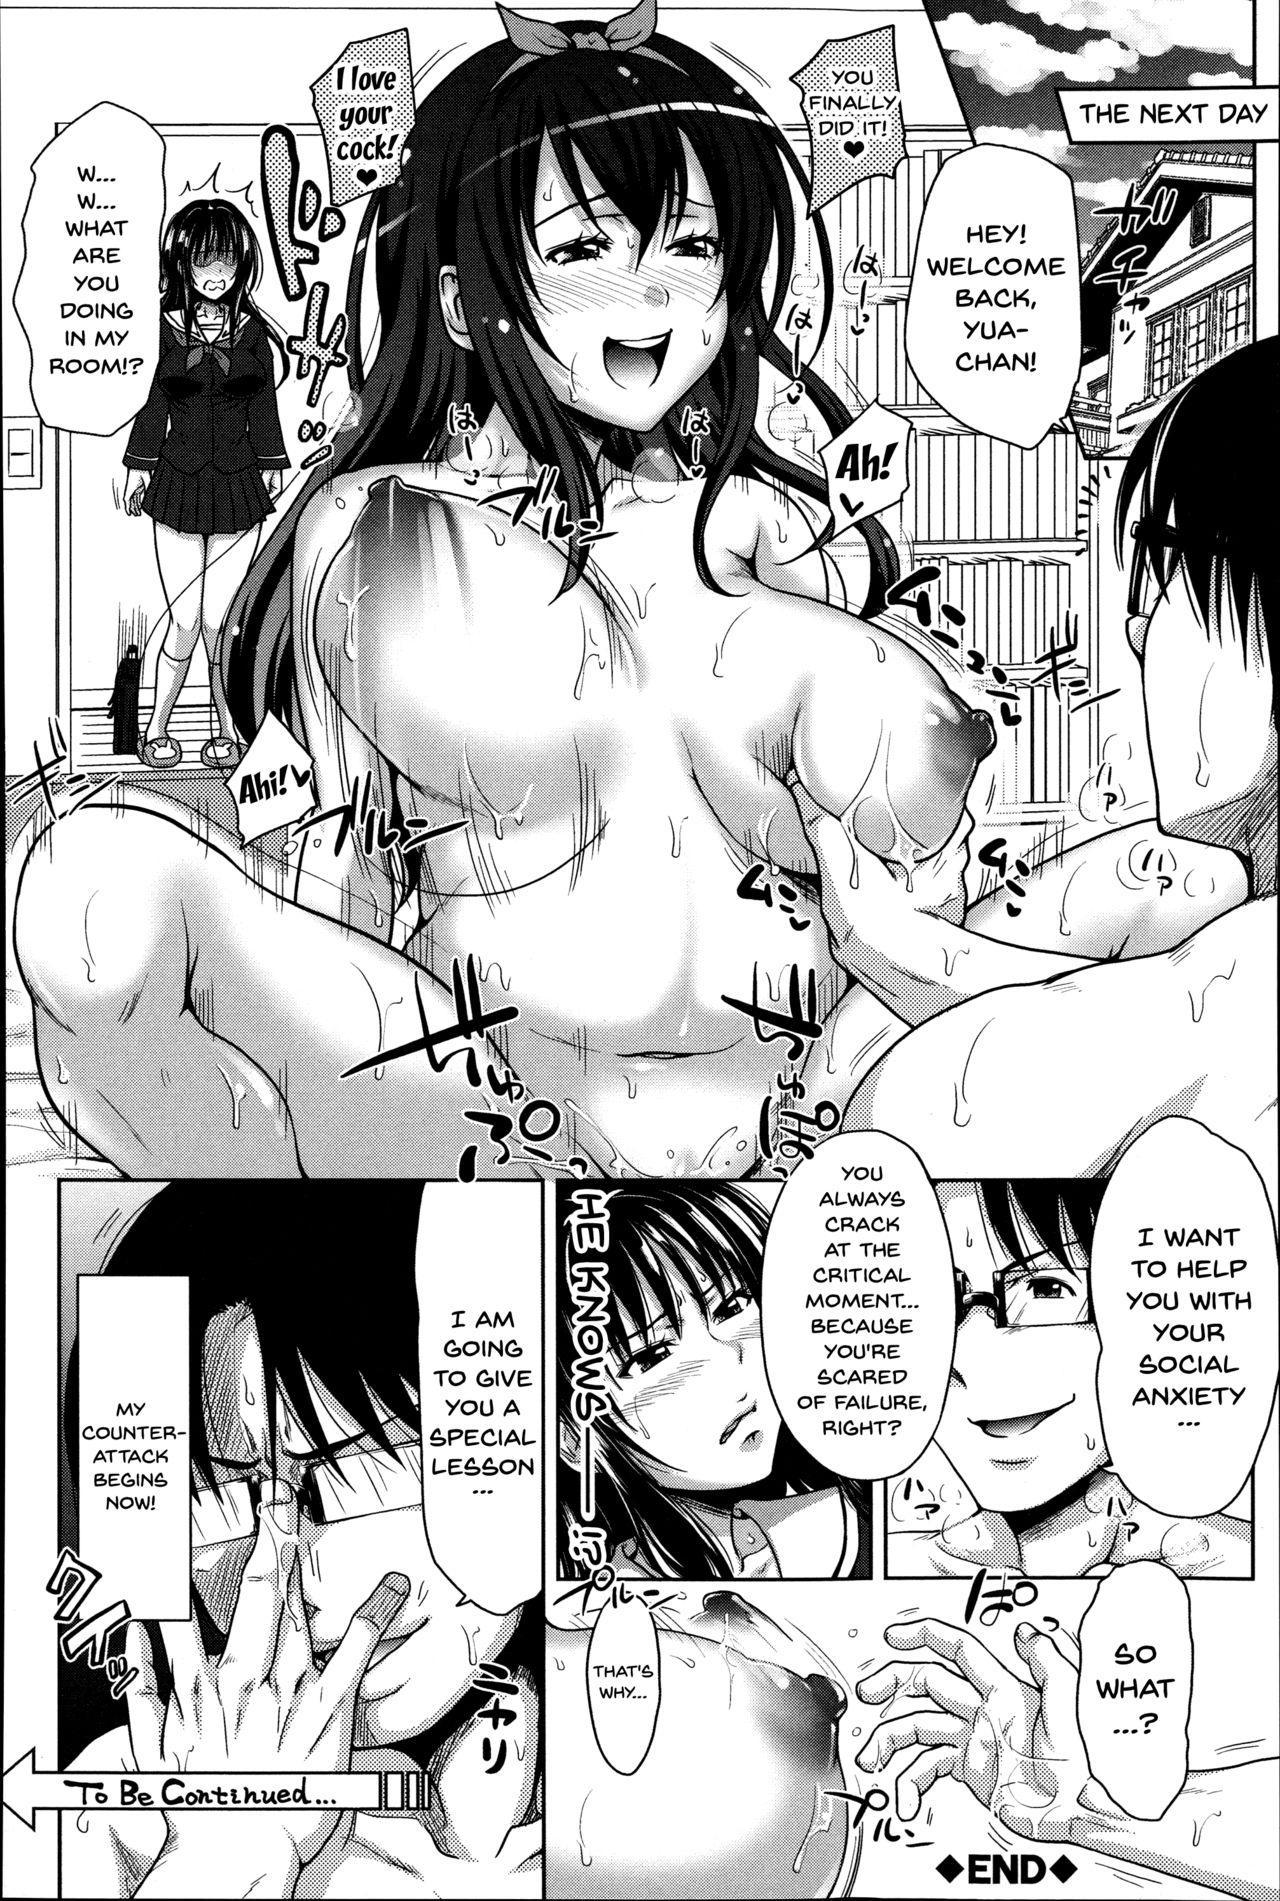 [Takuwan] Pakotate! Seikouritsu 0% no Teppeki Bishojo VS Seikouritsu 100% no Hentai Katei Kyoushi   Pakotate! Sex Rate 0% Iron-Willed Beautiful Virgins VS Sex Rate 100% Perverted Coach Ch.1-5 [English] {Doujins.com} 87